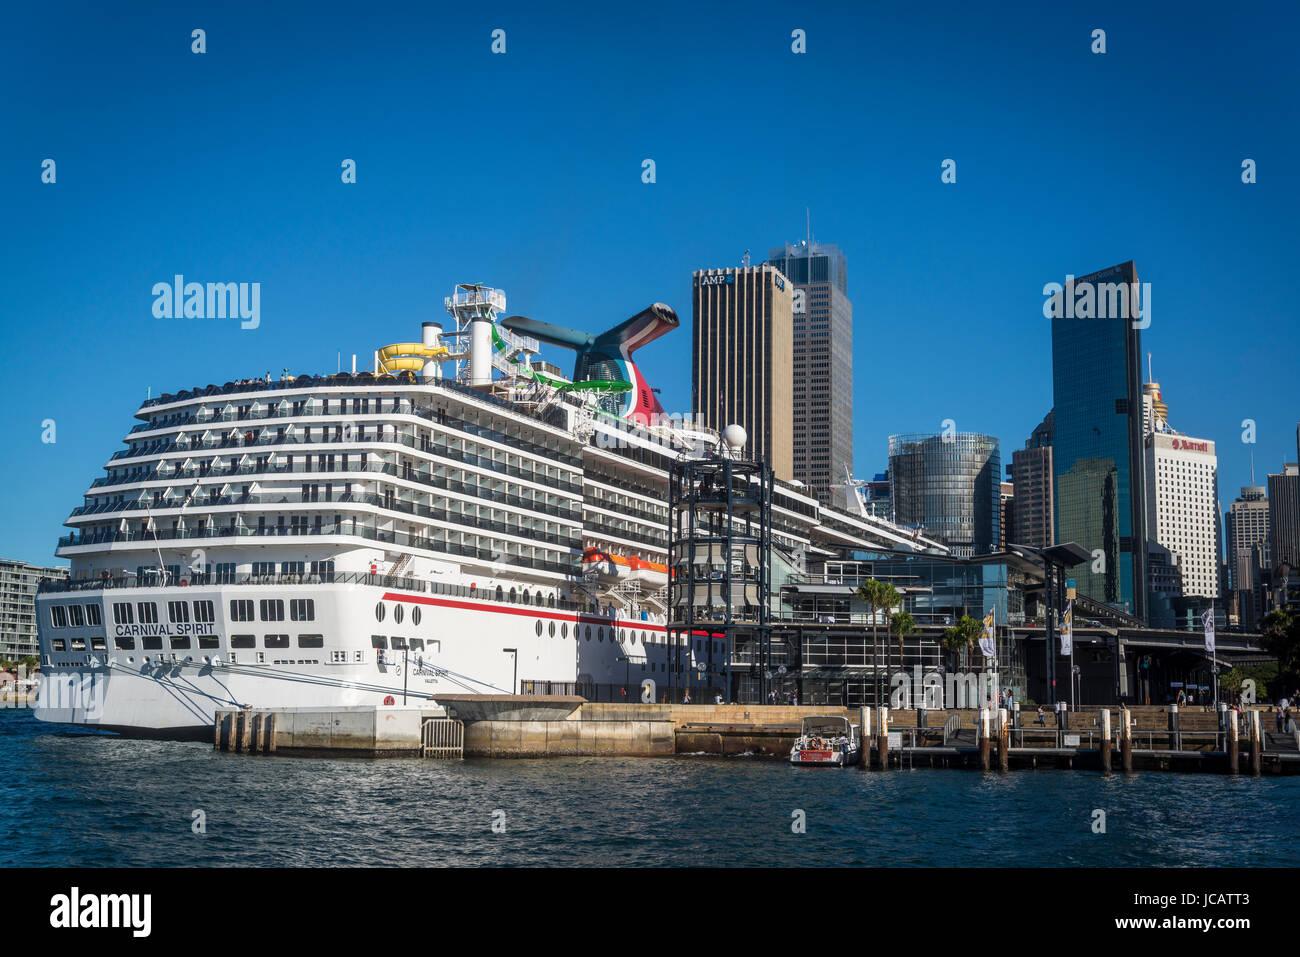 Cruise liner moored at Sydney Cove Passenger Terminal, Sydney Harbour, Sydney, NSW, Australia - Stock Image